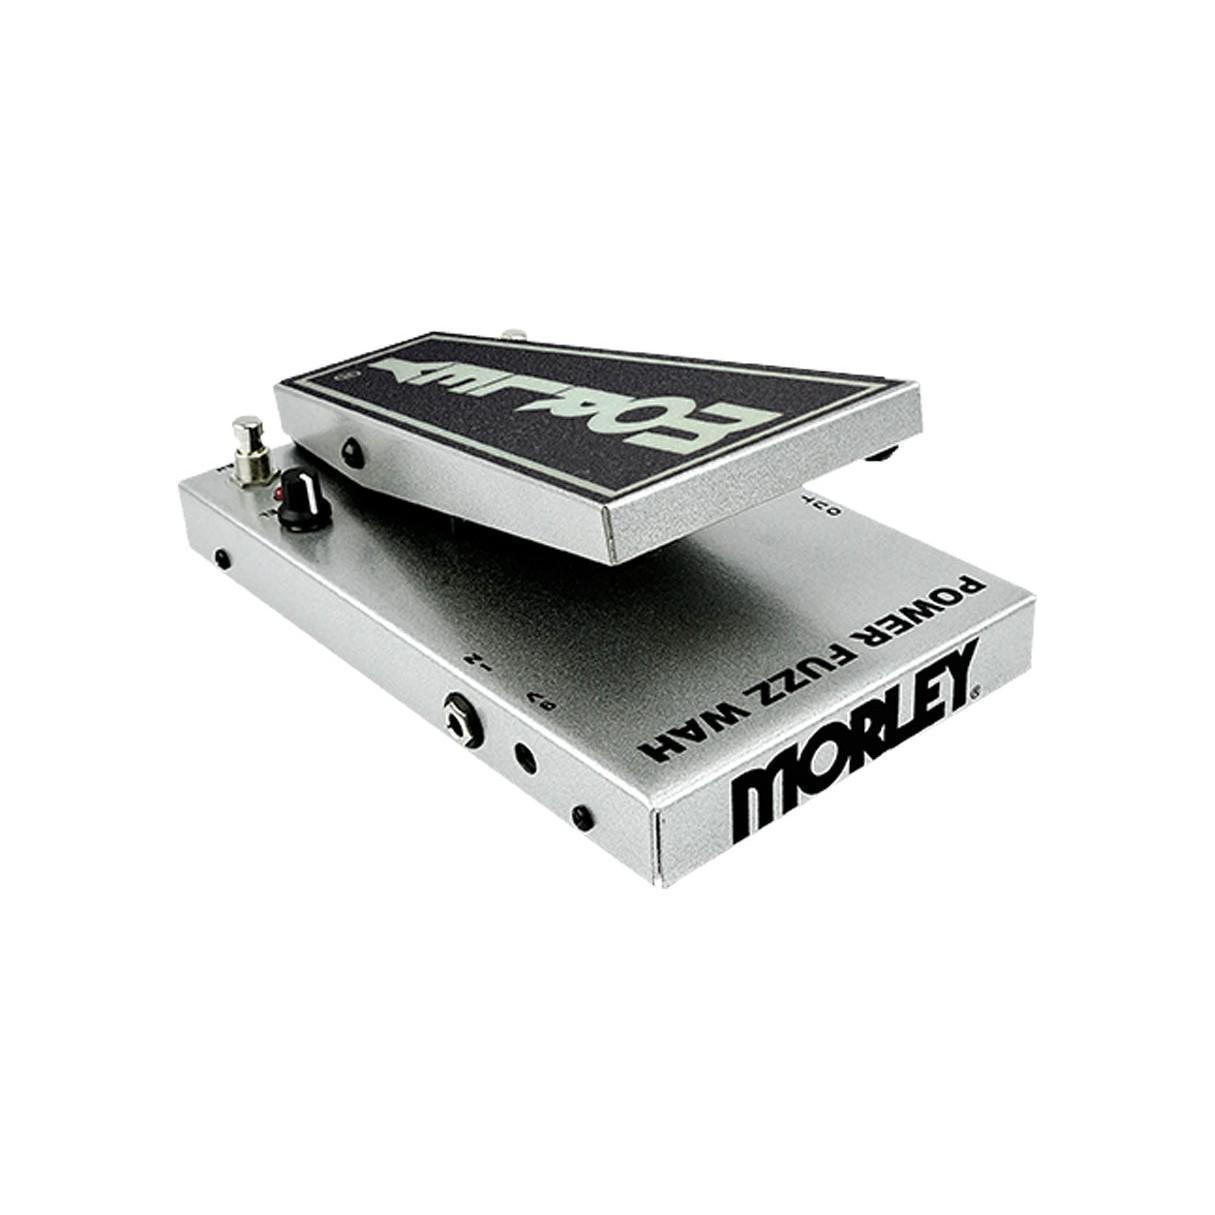 morley chrome cliff burton power fuzz wah pedal. Black Bedroom Furniture Sets. Home Design Ideas